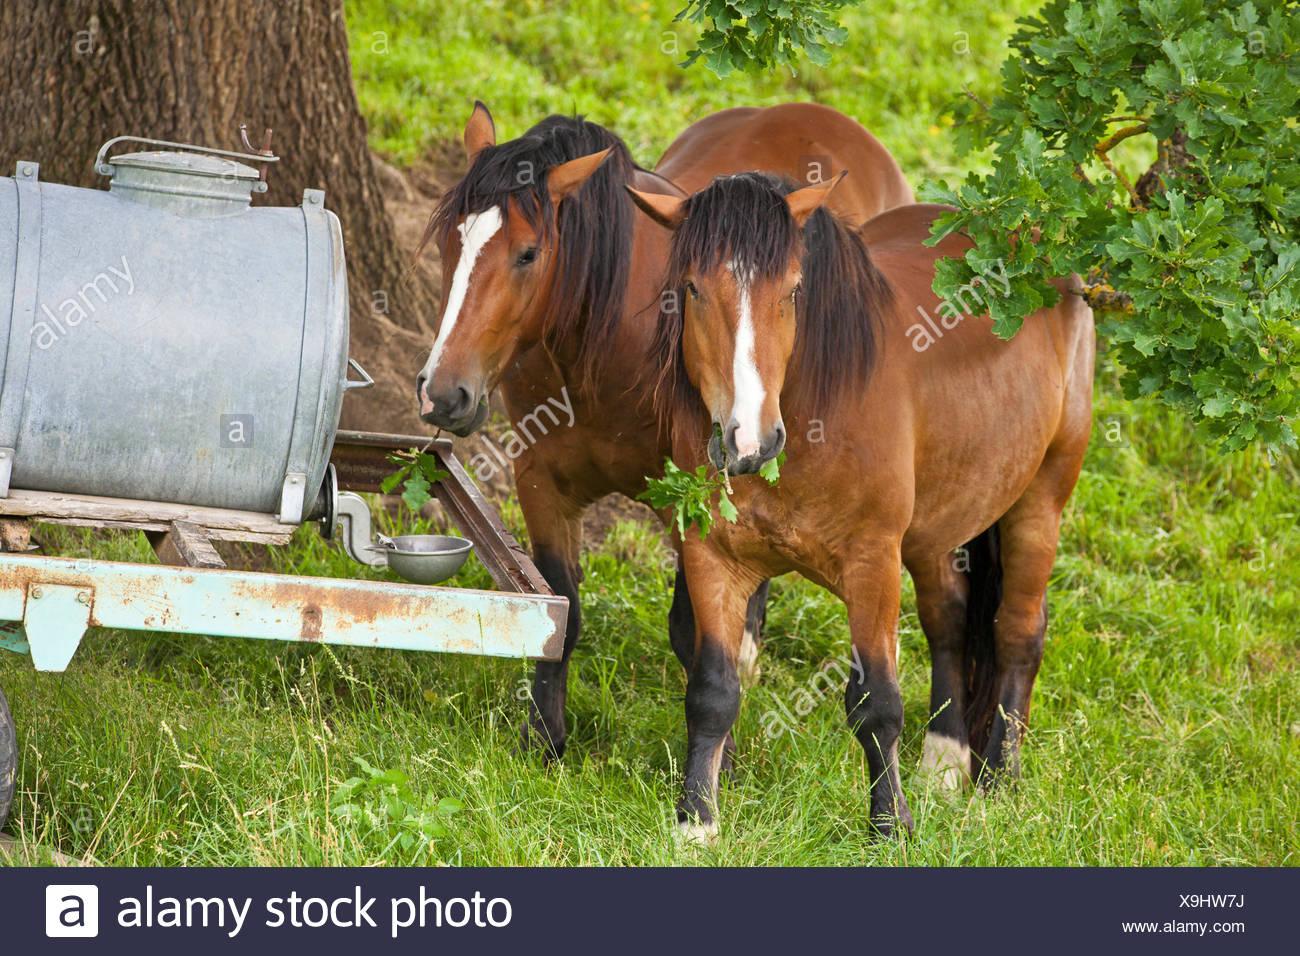 Caballo doméstico (Equus caballus przewalskii f.), en una horsetrough alimentándose de hojas de roble, Alemania, Baviera Imagen De Stock